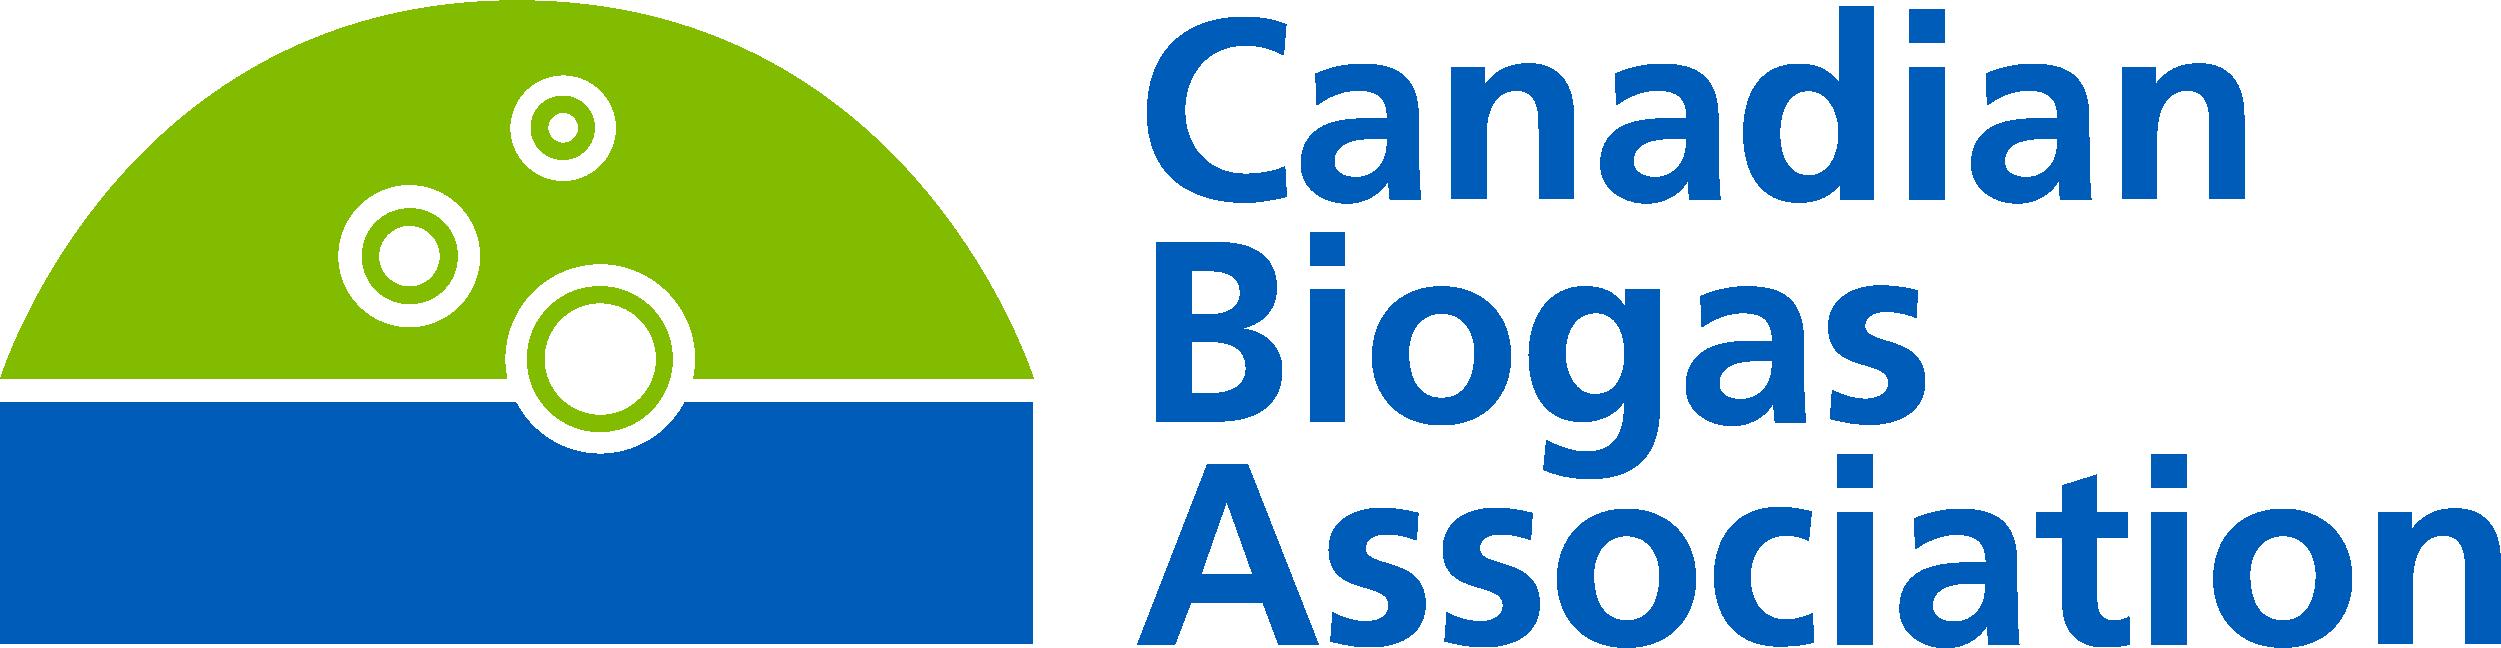 canadian biogas association logo